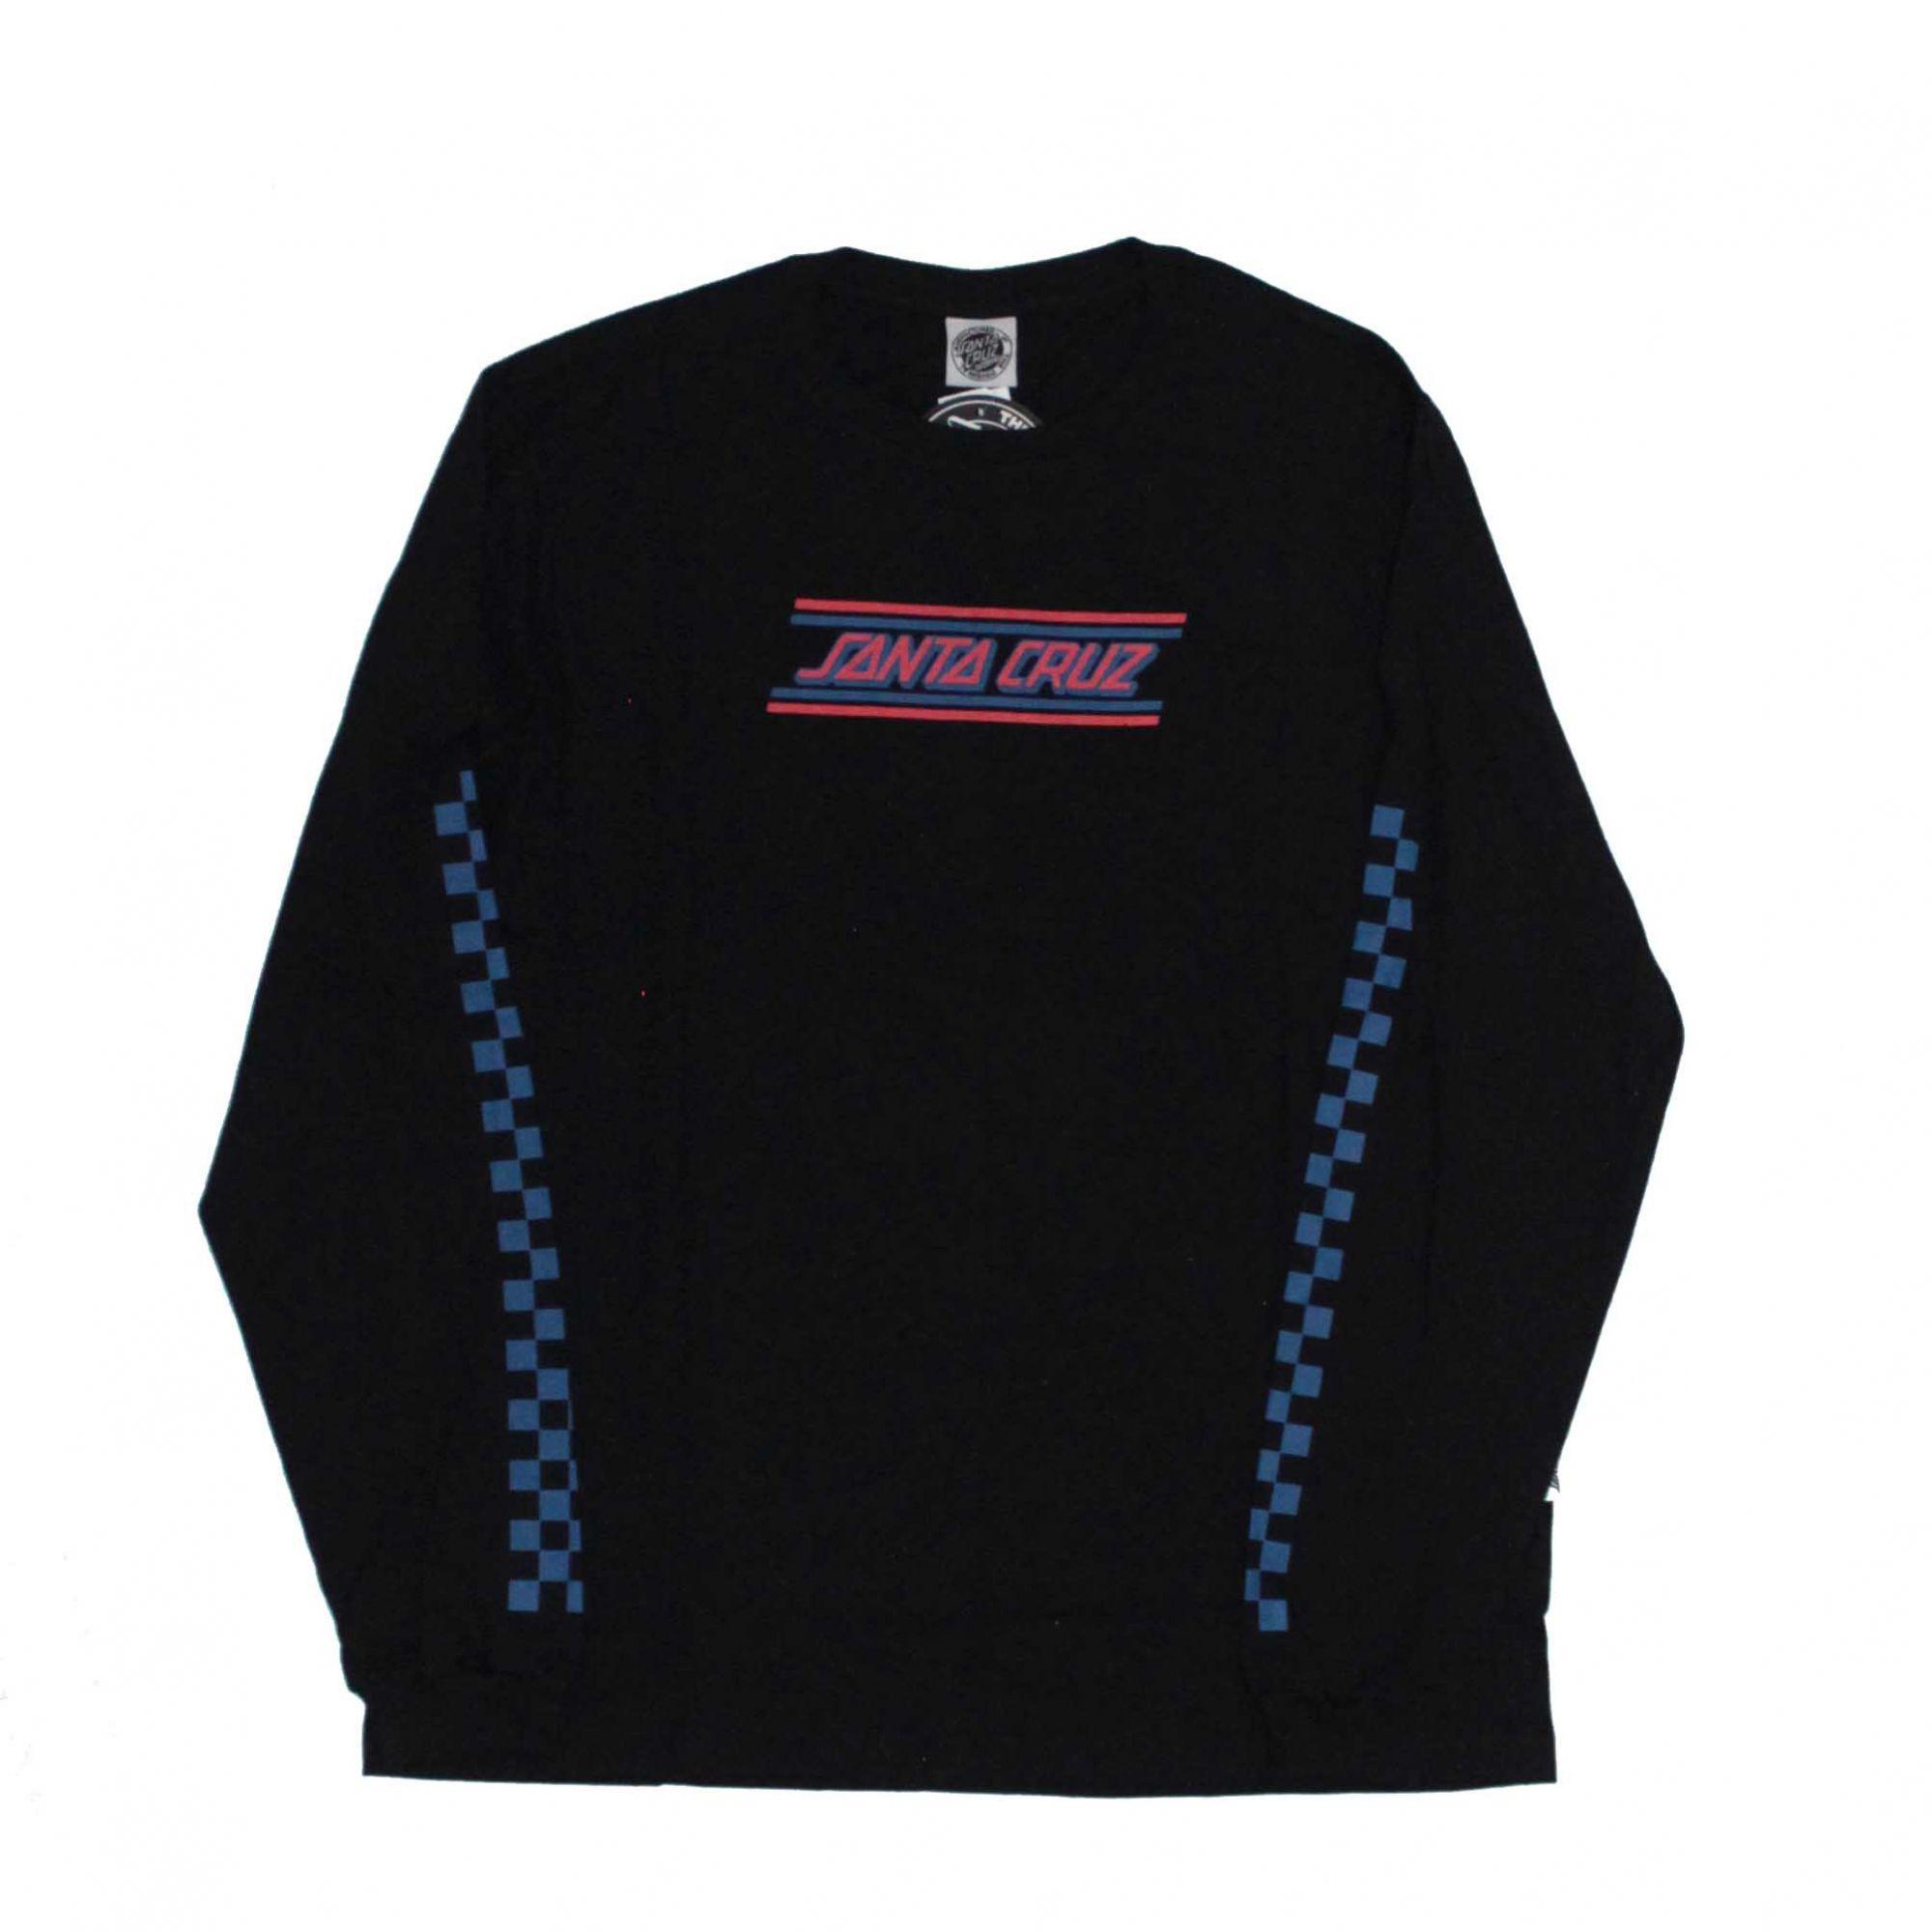 Camiseta Manga Longa Santa Cruz Check Strip Hue Preto